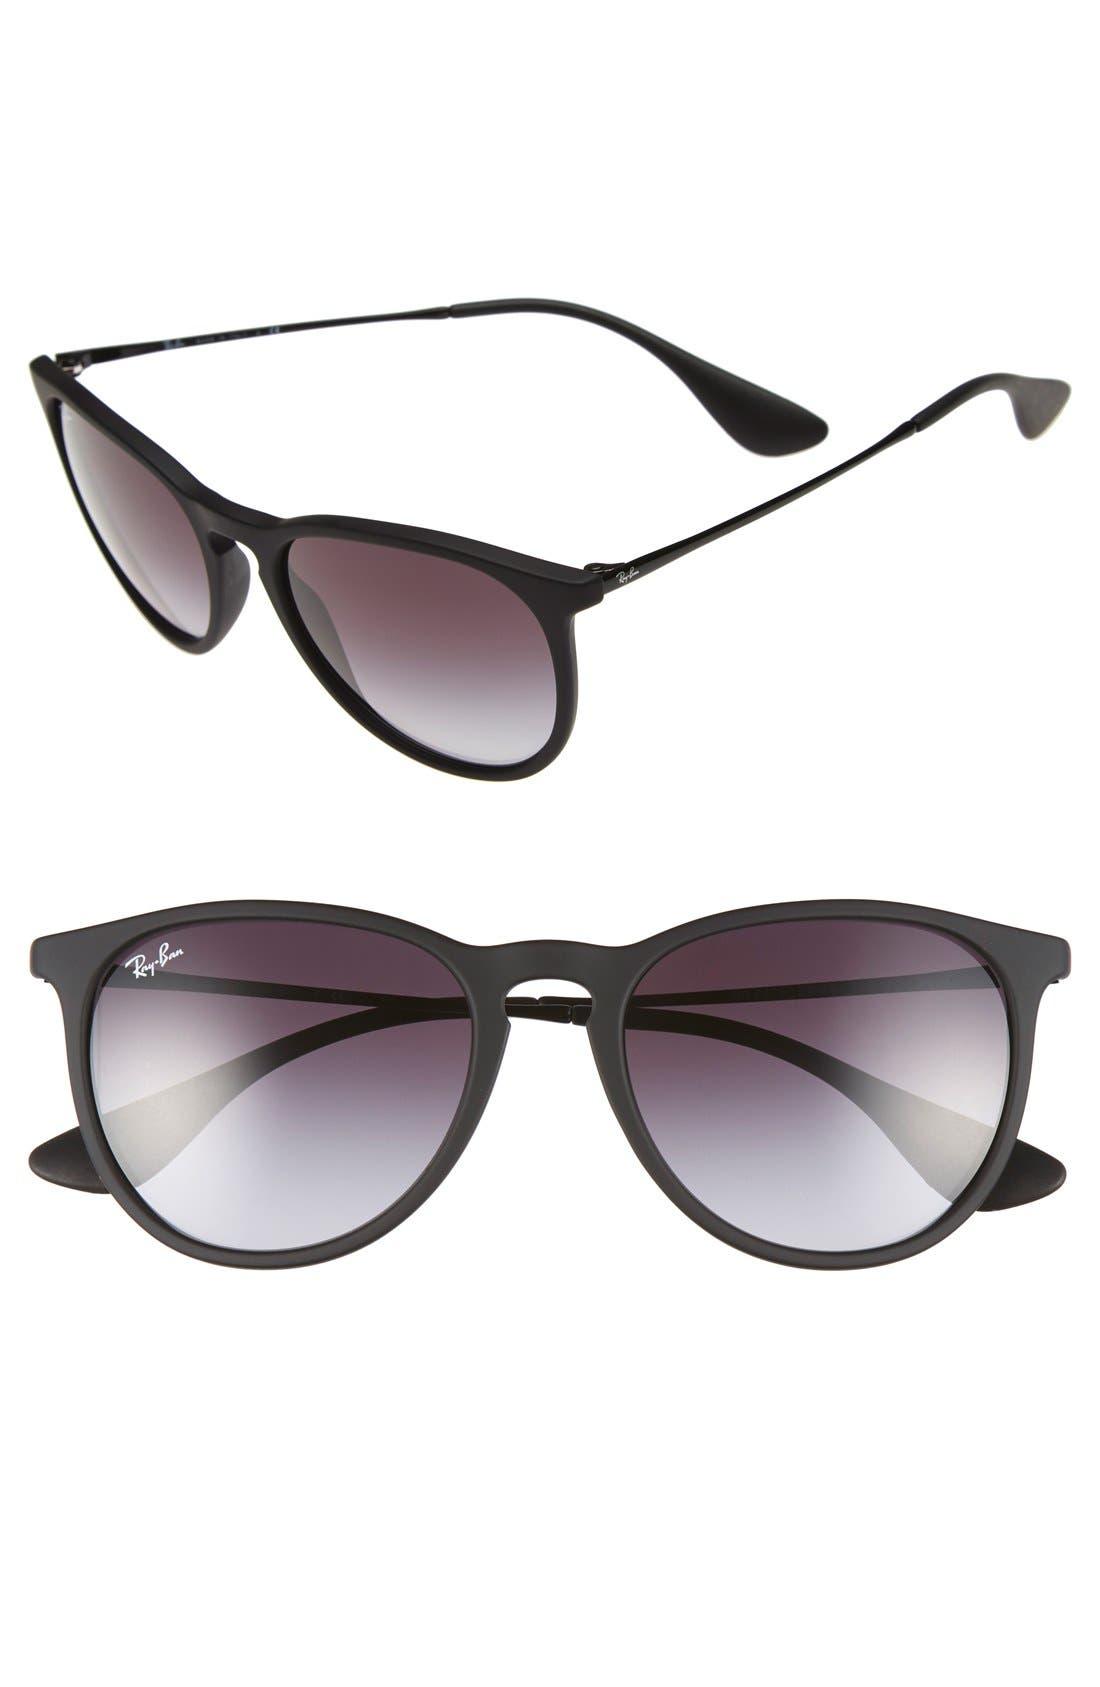 54mm Keyhole Sunglasses,                             Main thumbnail 1, color,                             MATTE BLACK